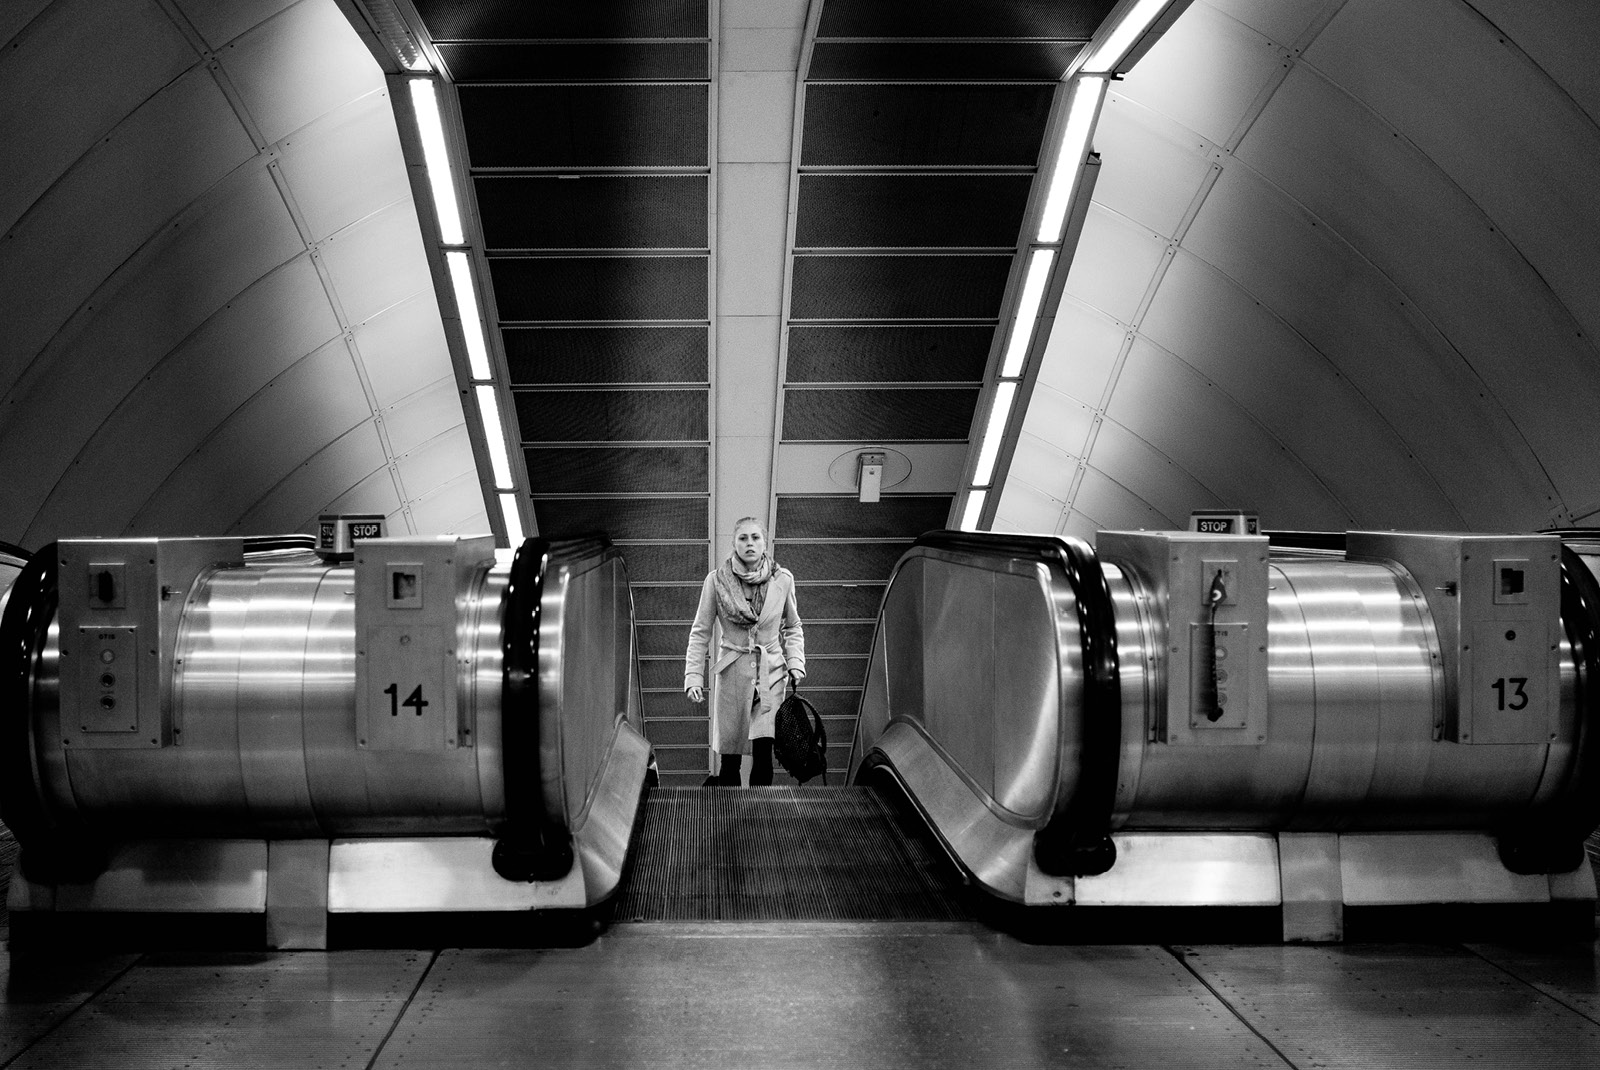 24-hours-on-the-london-underground-night-tube-street-photography-tarikahmet-escalators